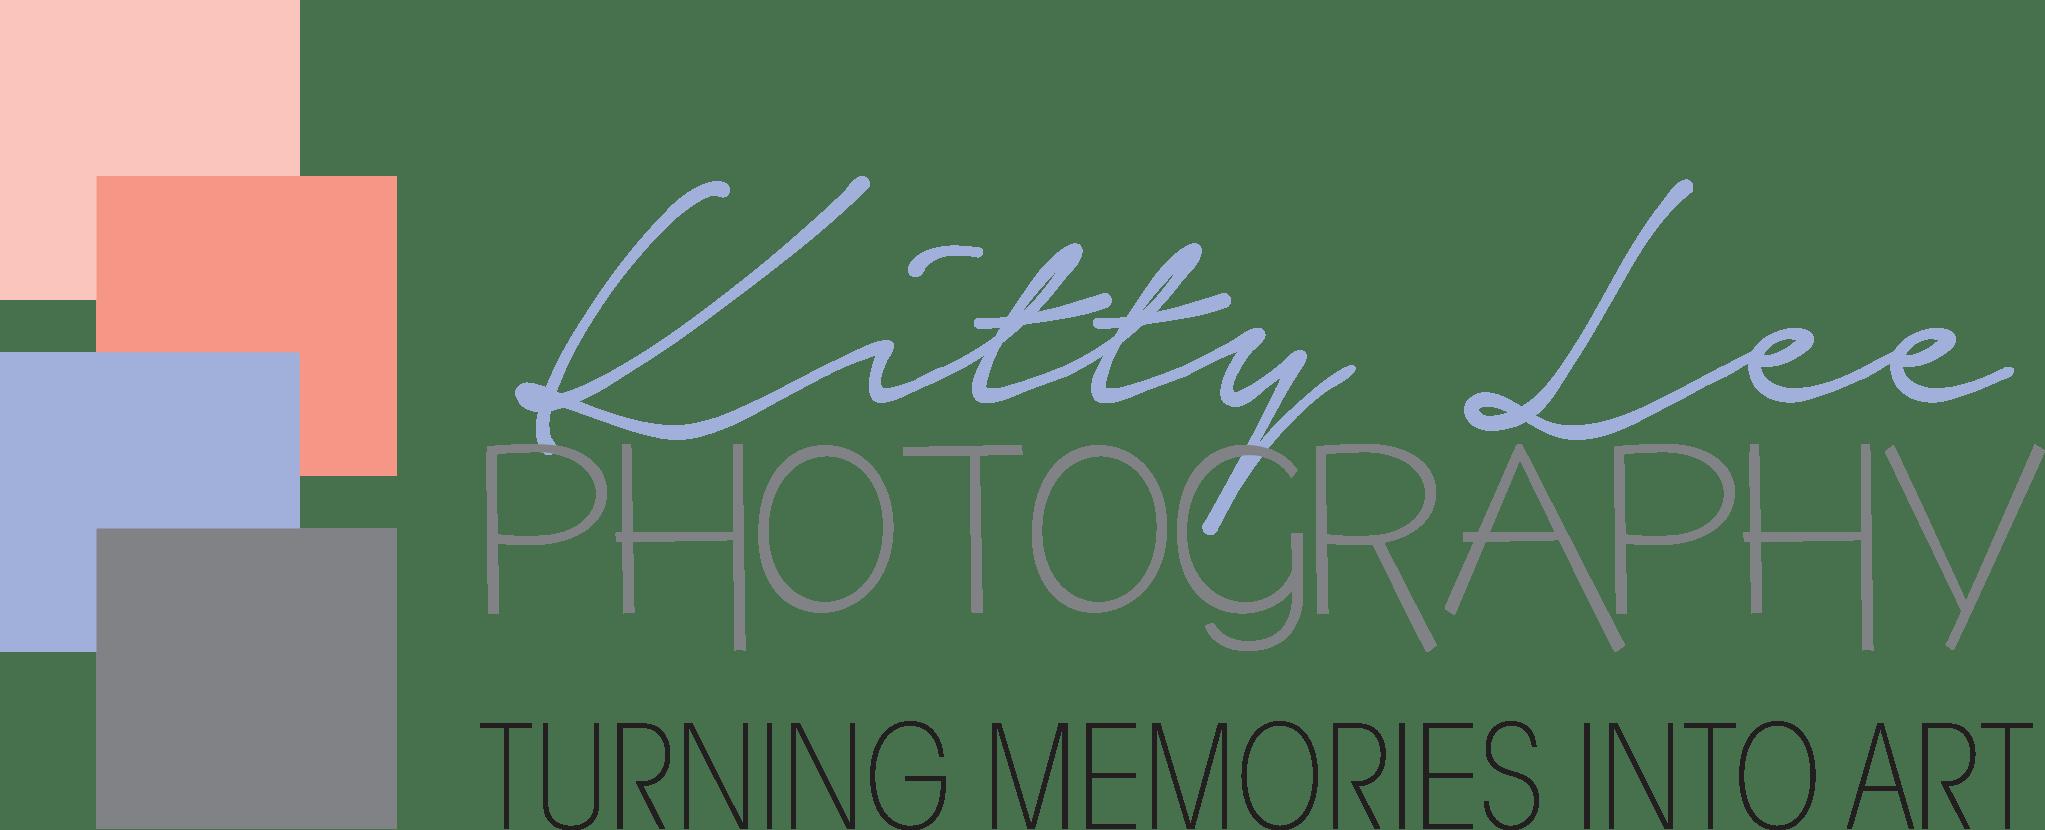 Kitty Lee Photography logo